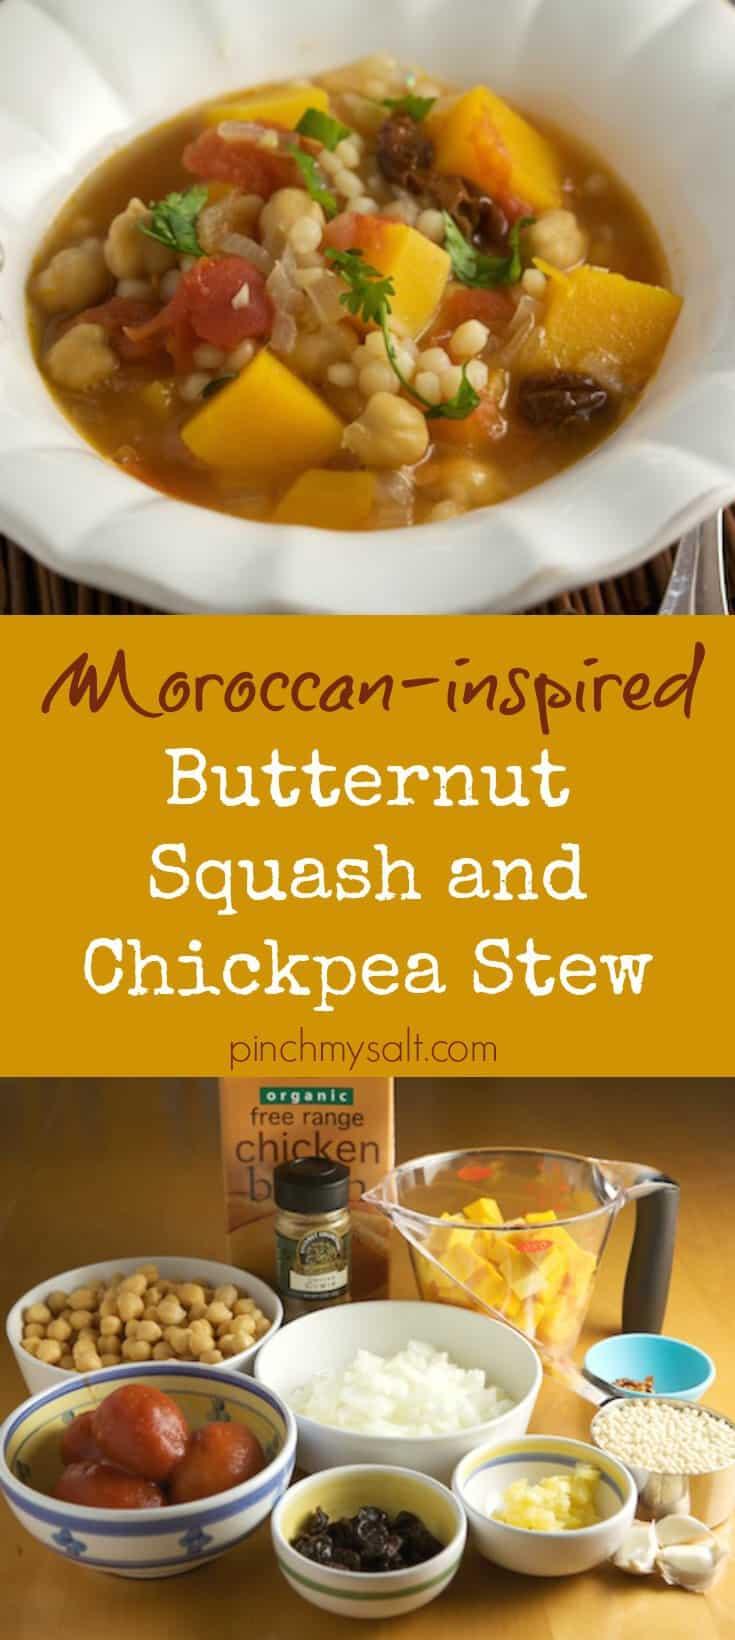 Butternut Squash and Chickpea Stew   pinchmysalt.com